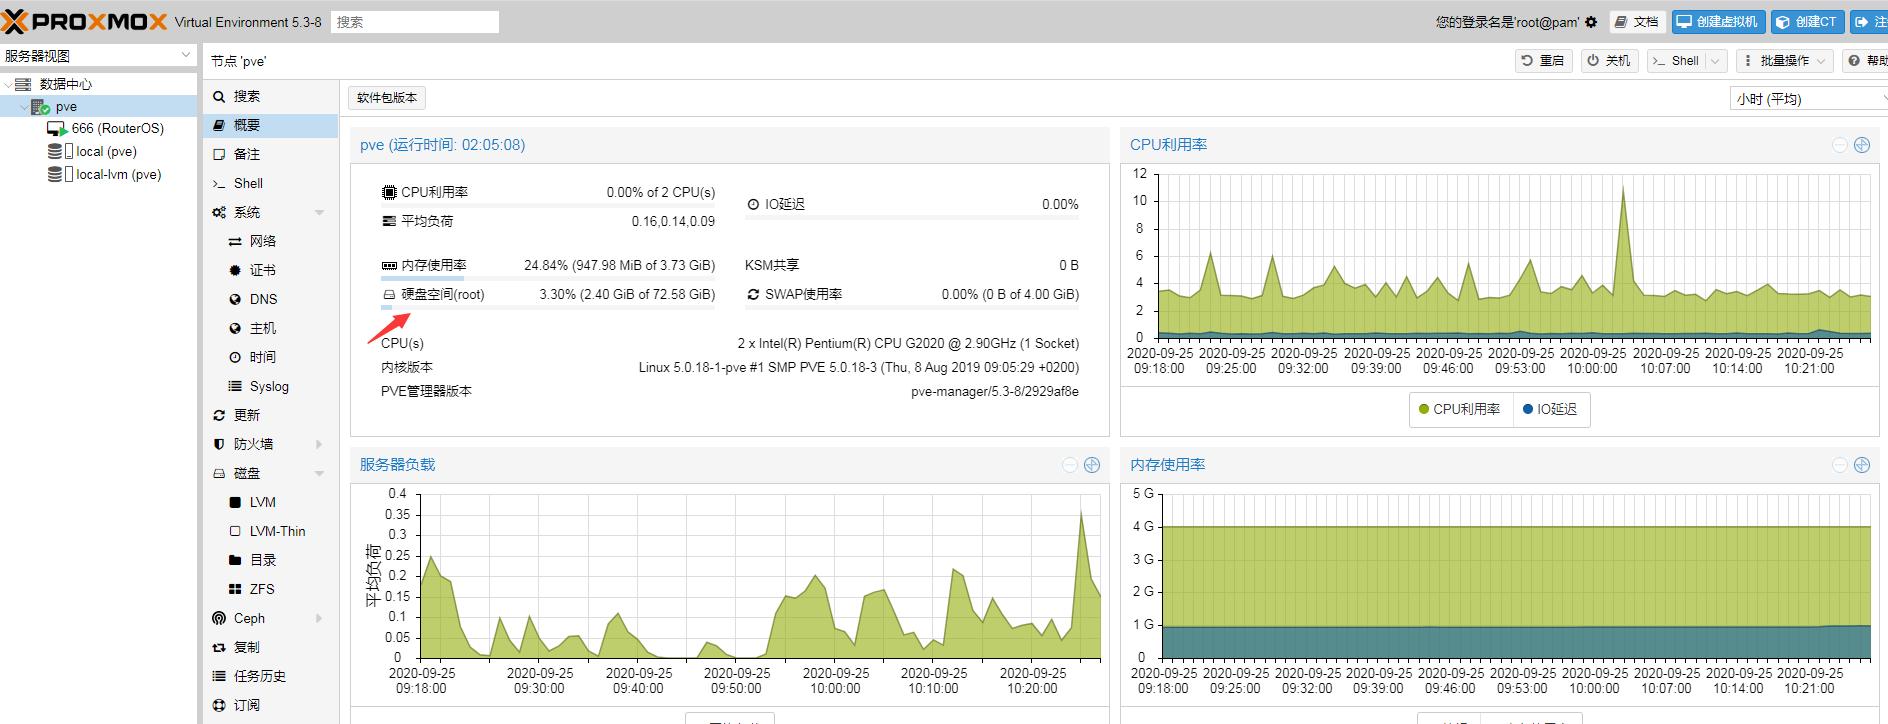 Proxmox VE调整储存方式,不使用lvmthin与调整local以及local-lvm空间-七界传说丨关注分享网络、硬件、维护、游戏、主题、虚拟化、软件分享!